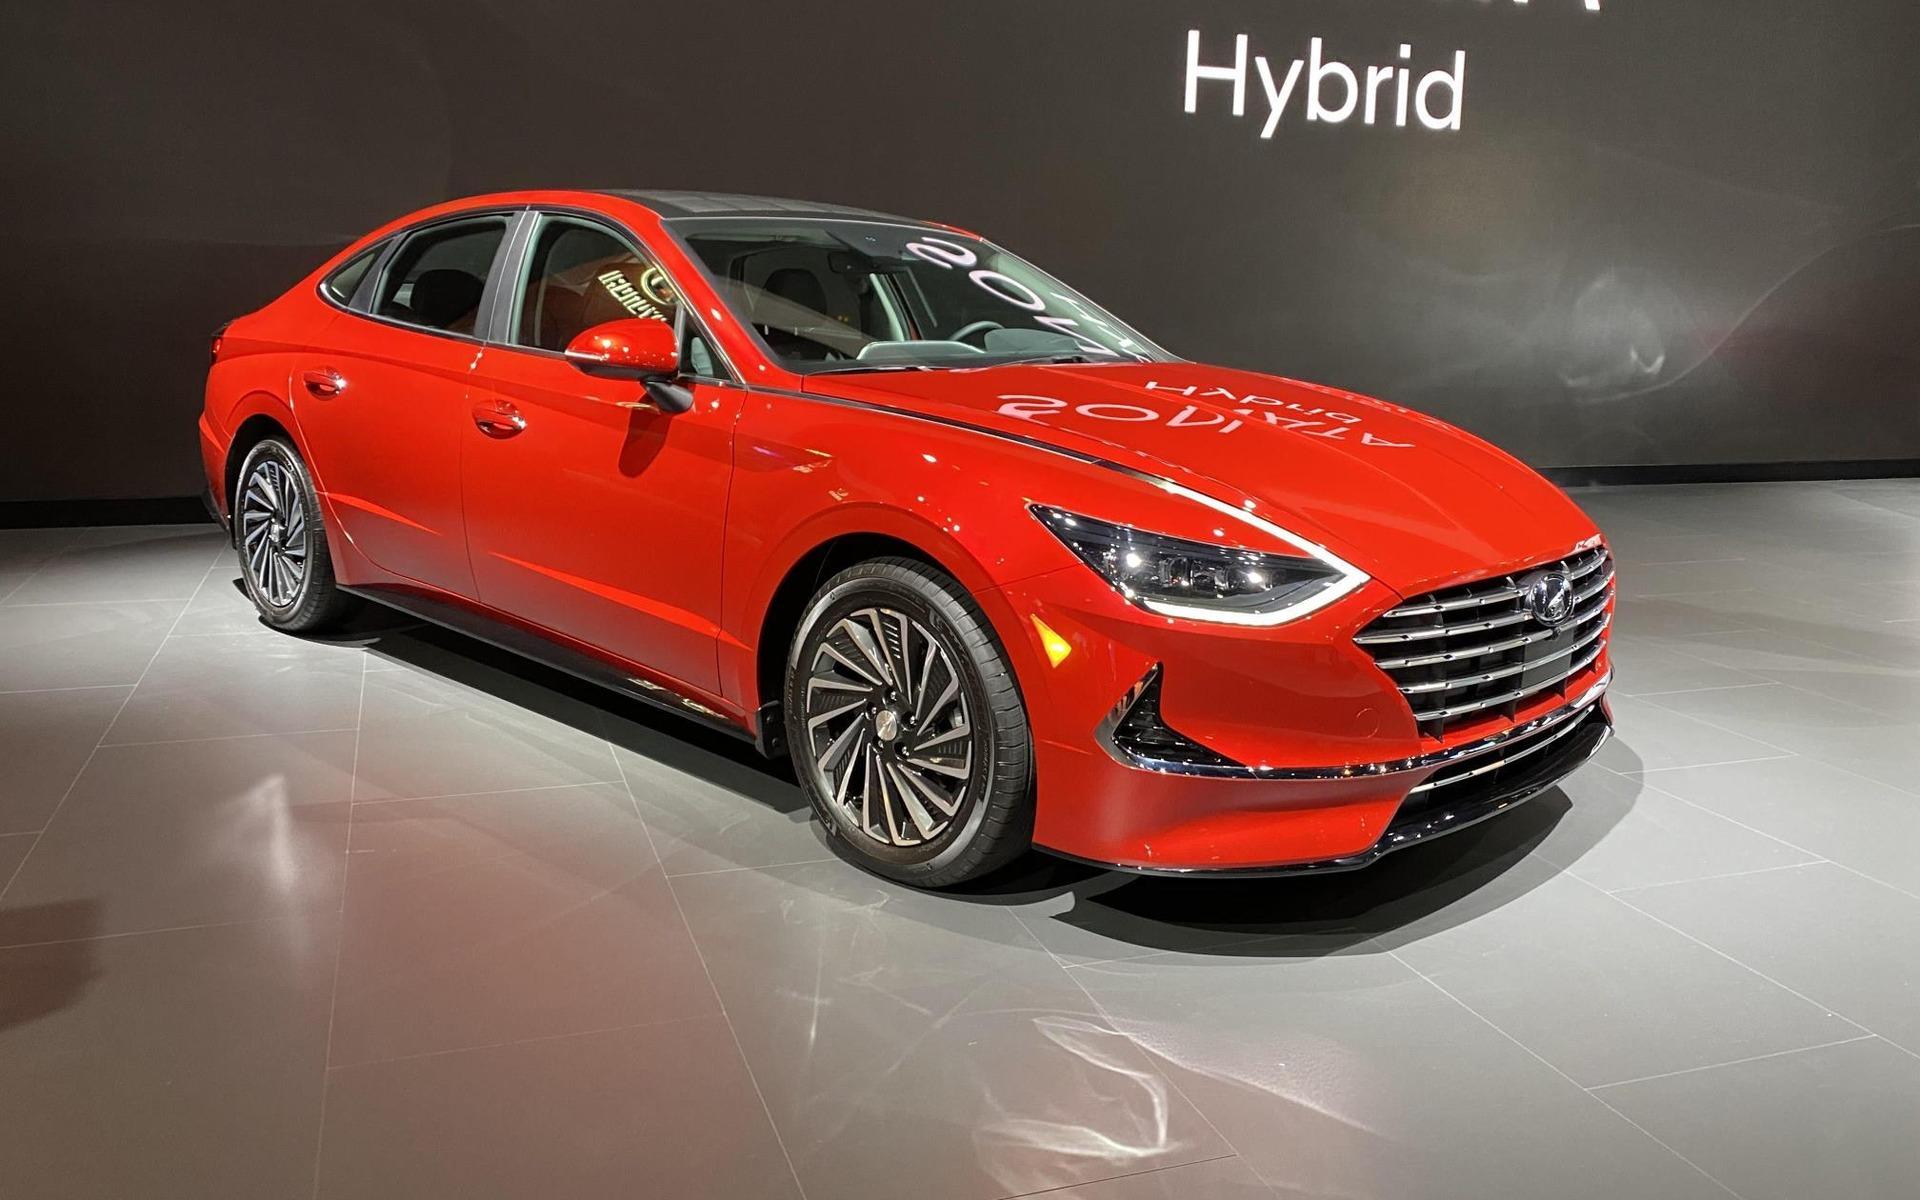 2020 Hyundai Sonata Hybrid Performance and New Engine